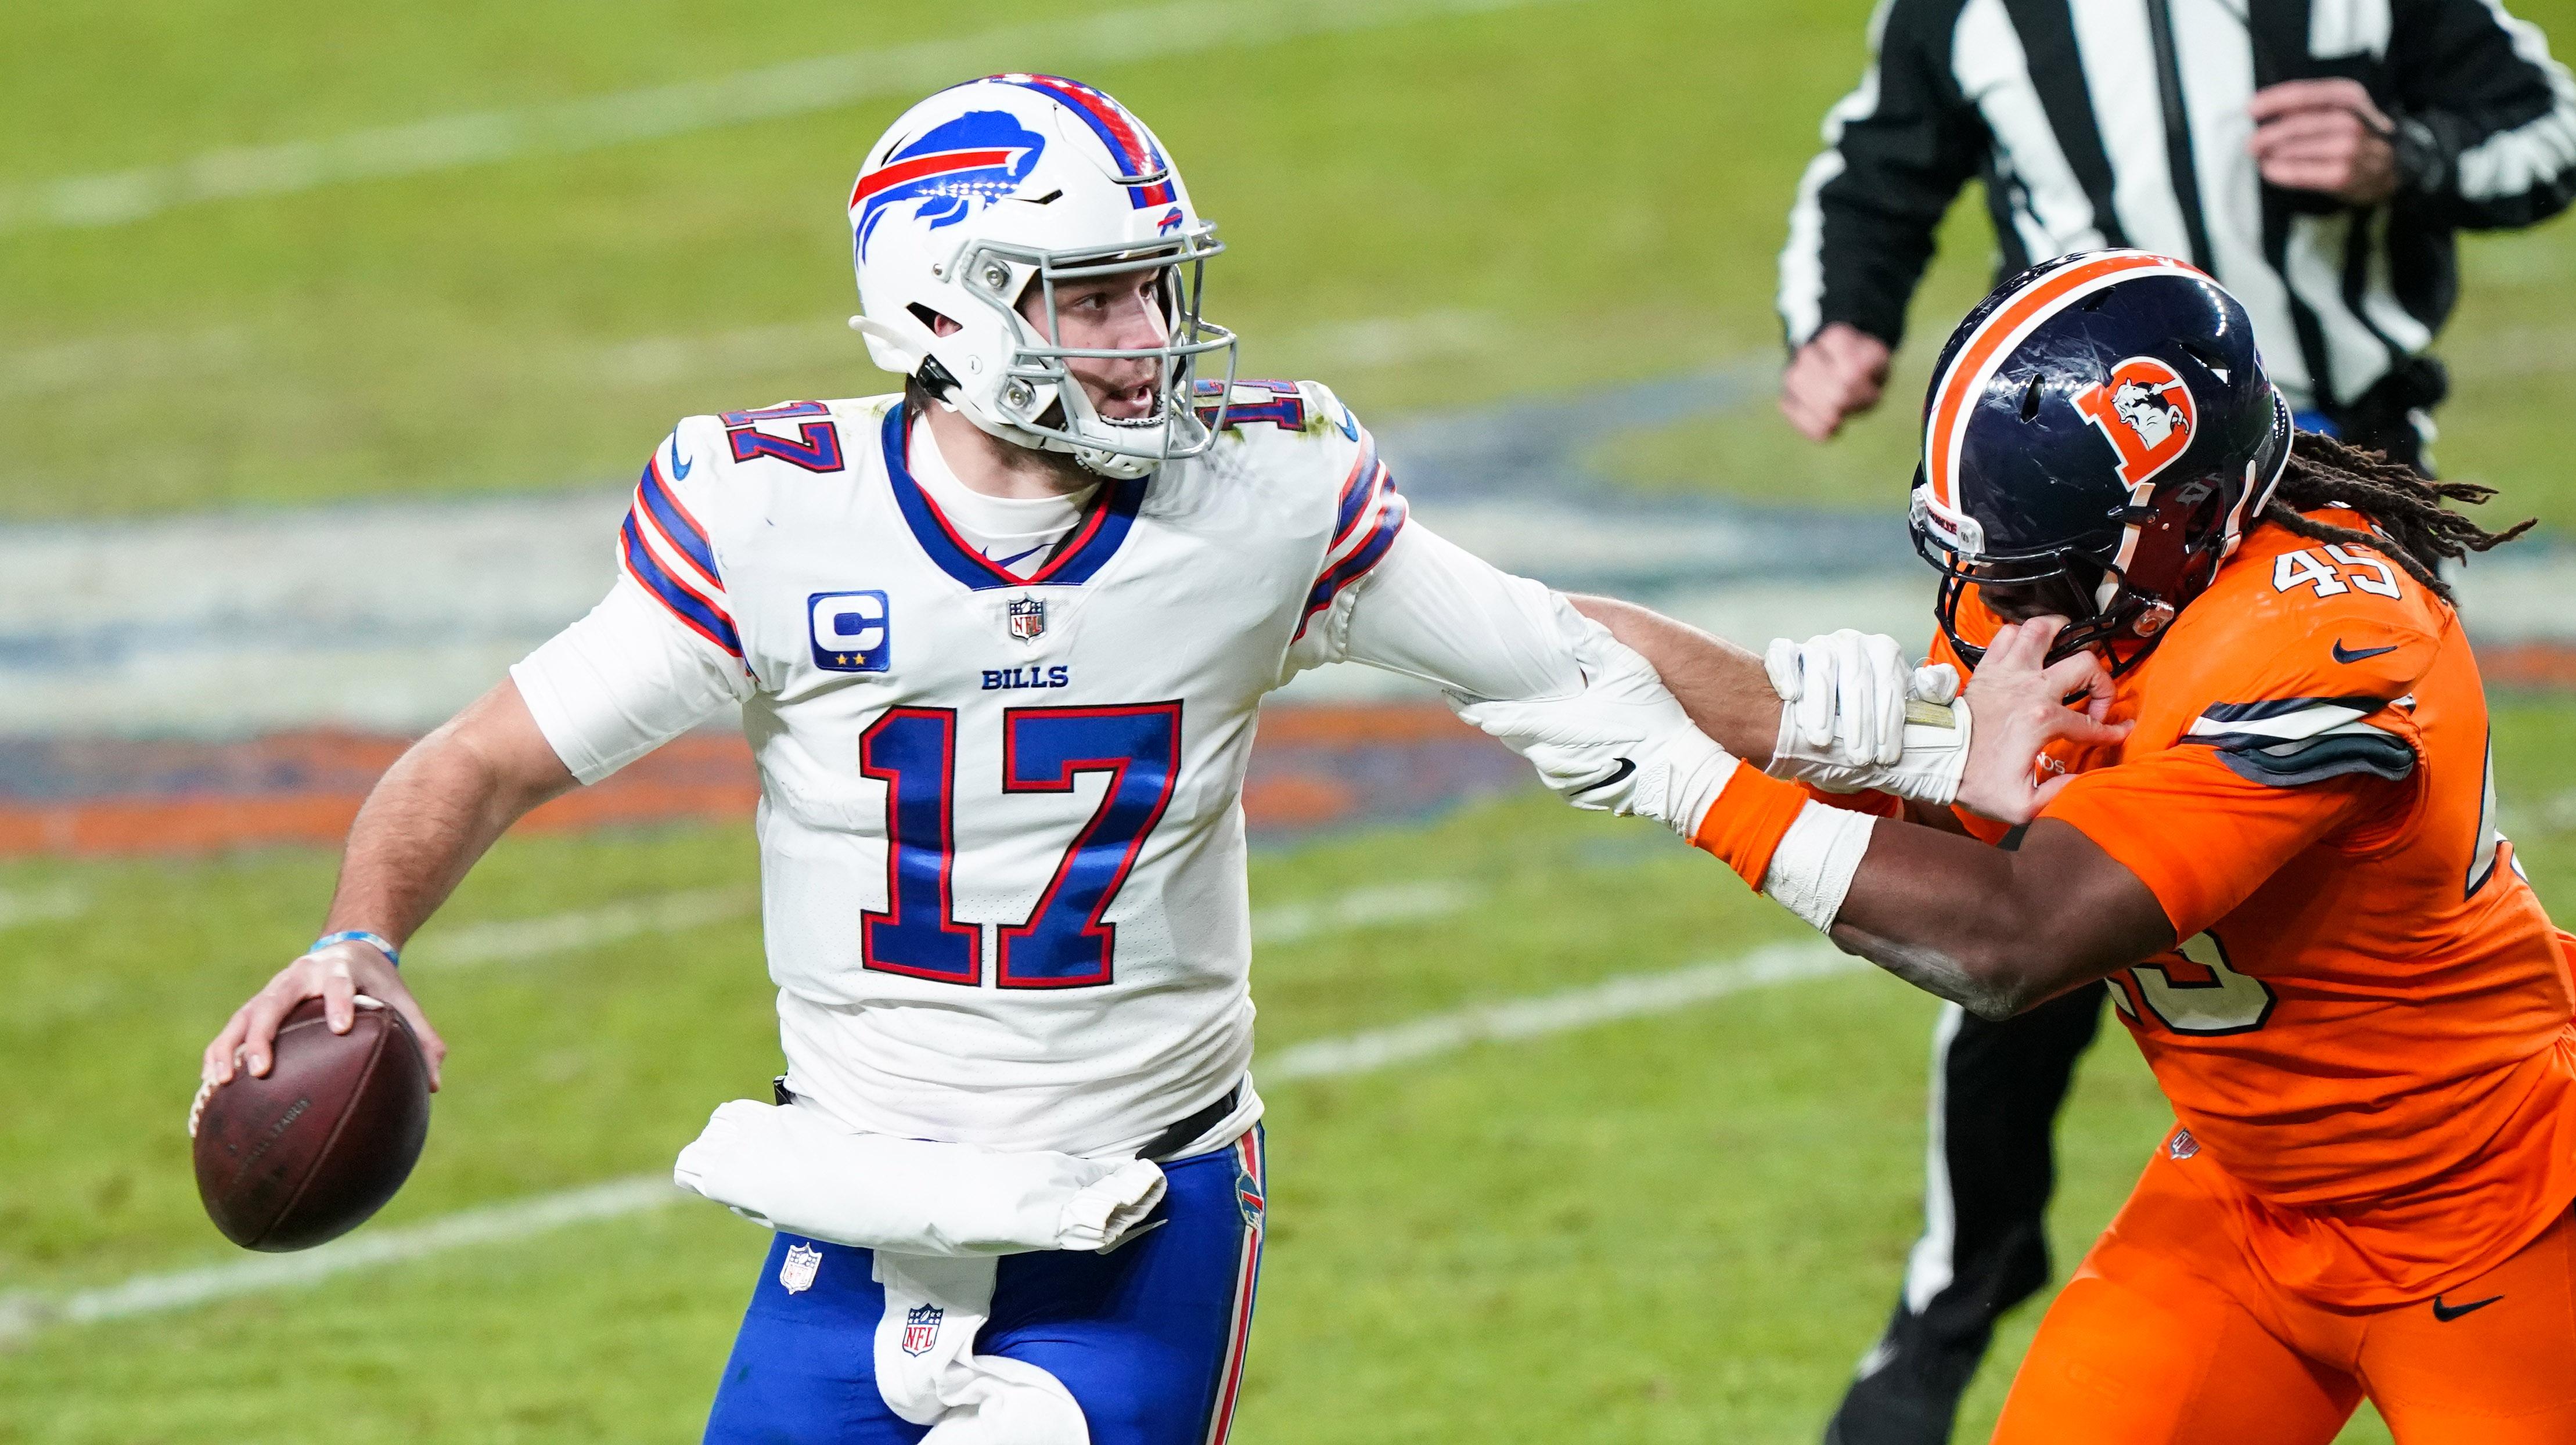 Buffalo Bills quarterback Josh Allen (17) stiff arms Denver Broncos linebacker A.J. Johnson (45) during the third quarter at Empower Field at Mile High.